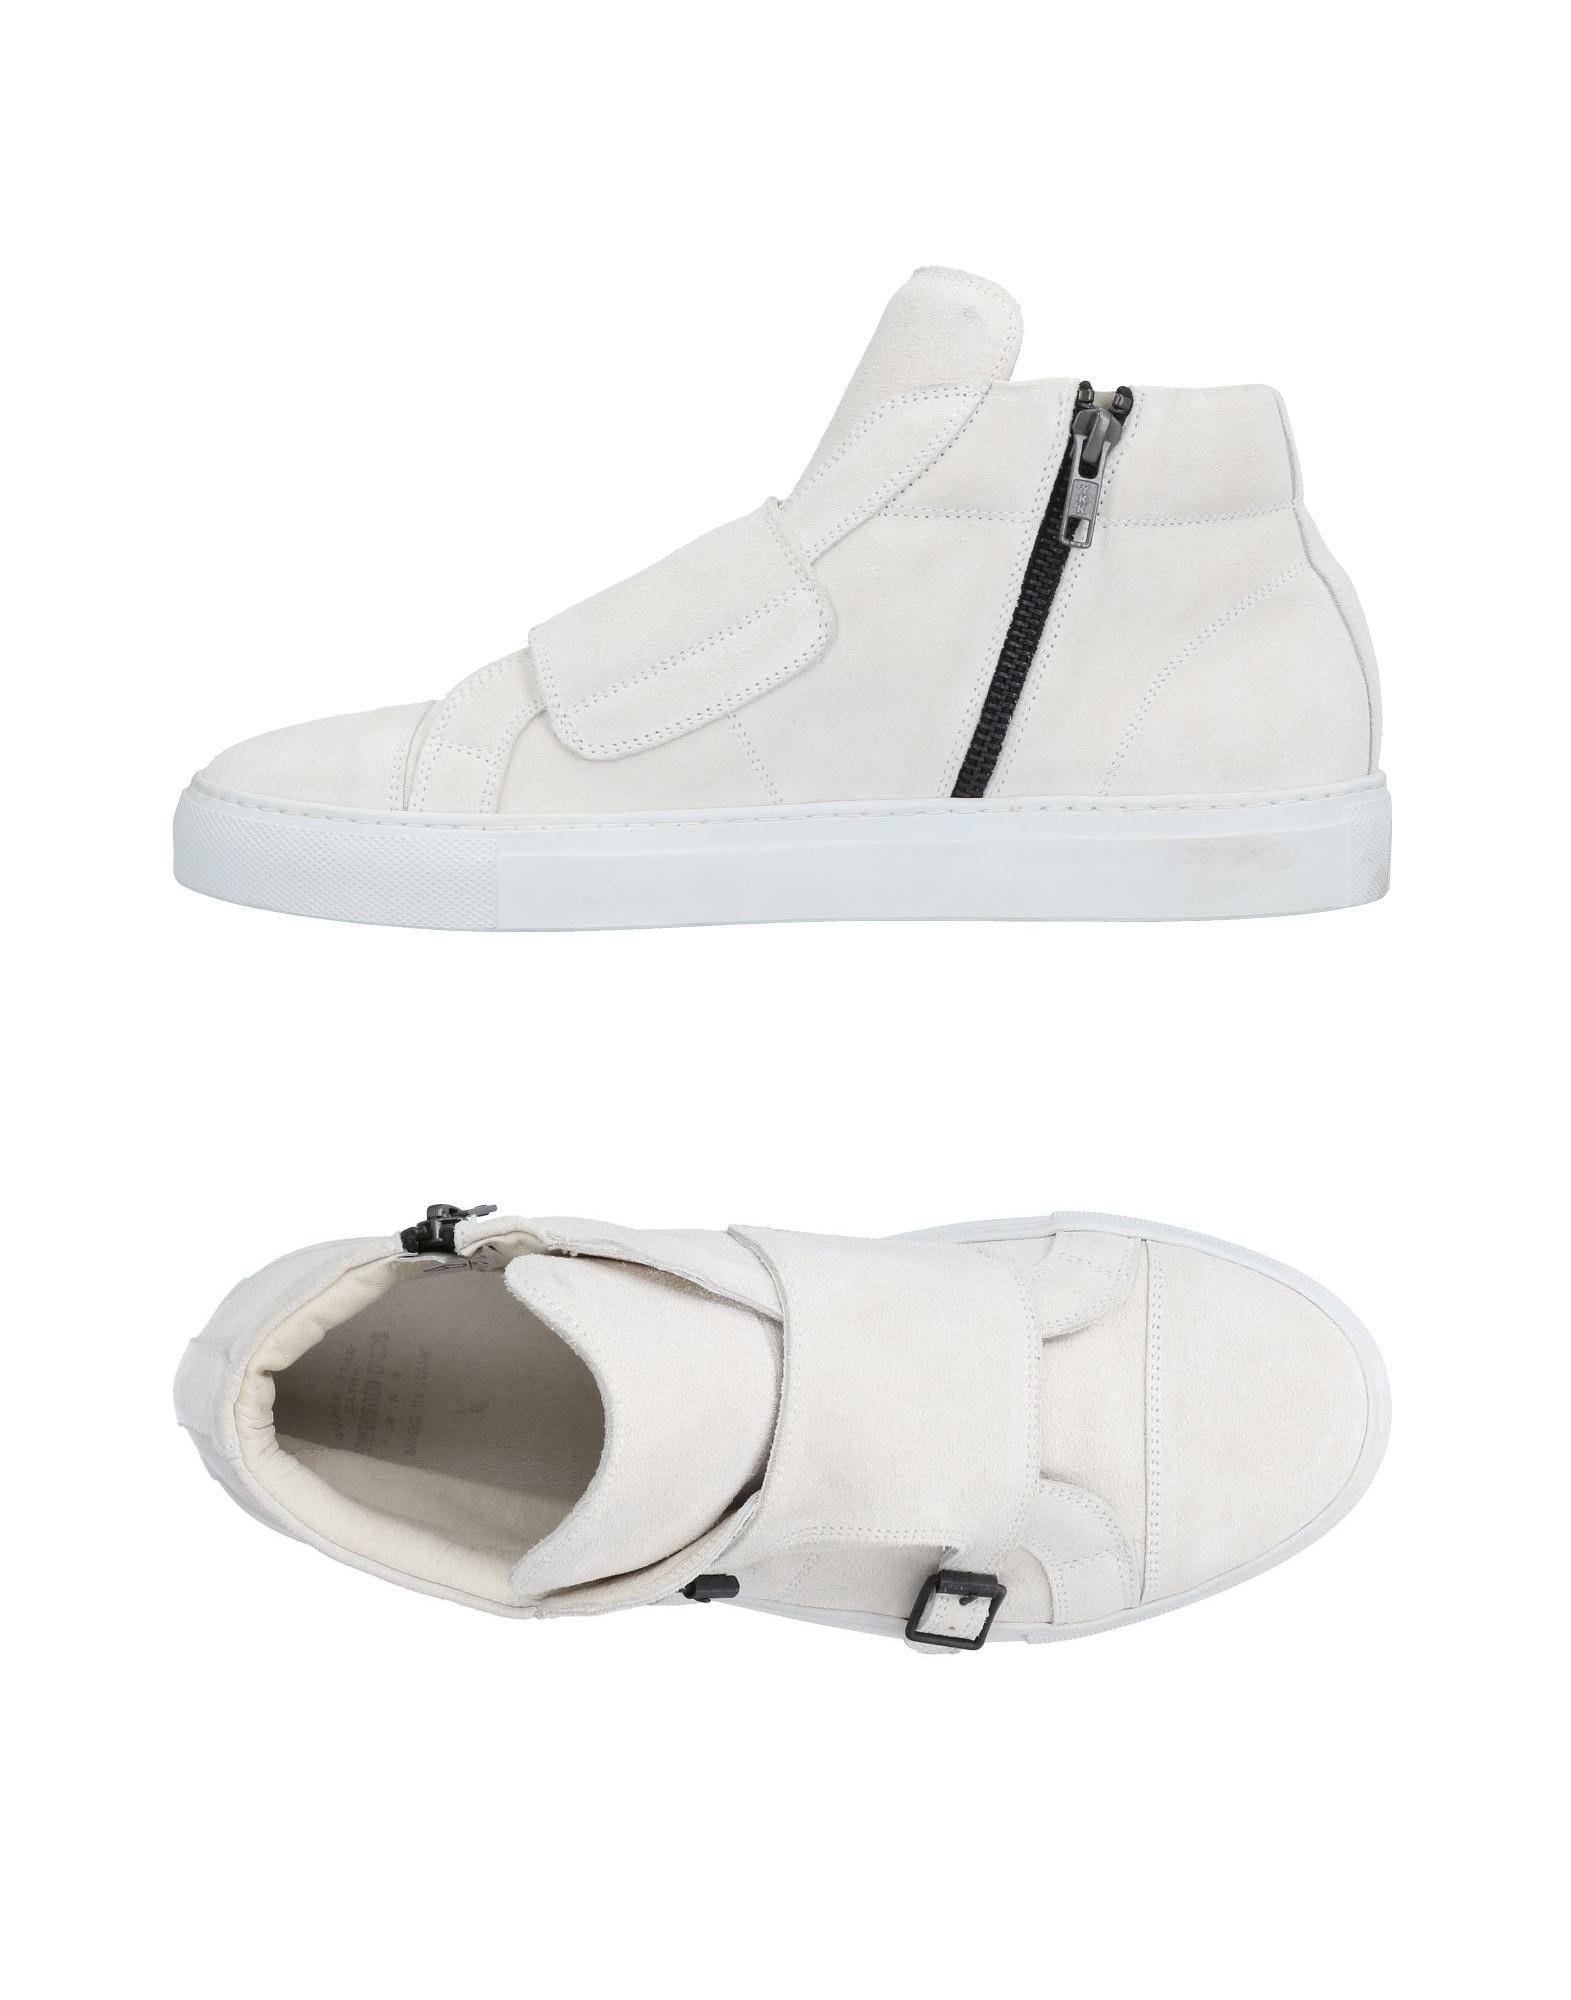 Pantofola D'oro Sneakers Herren  11503730WN Gute Qualität beliebte Schuhe